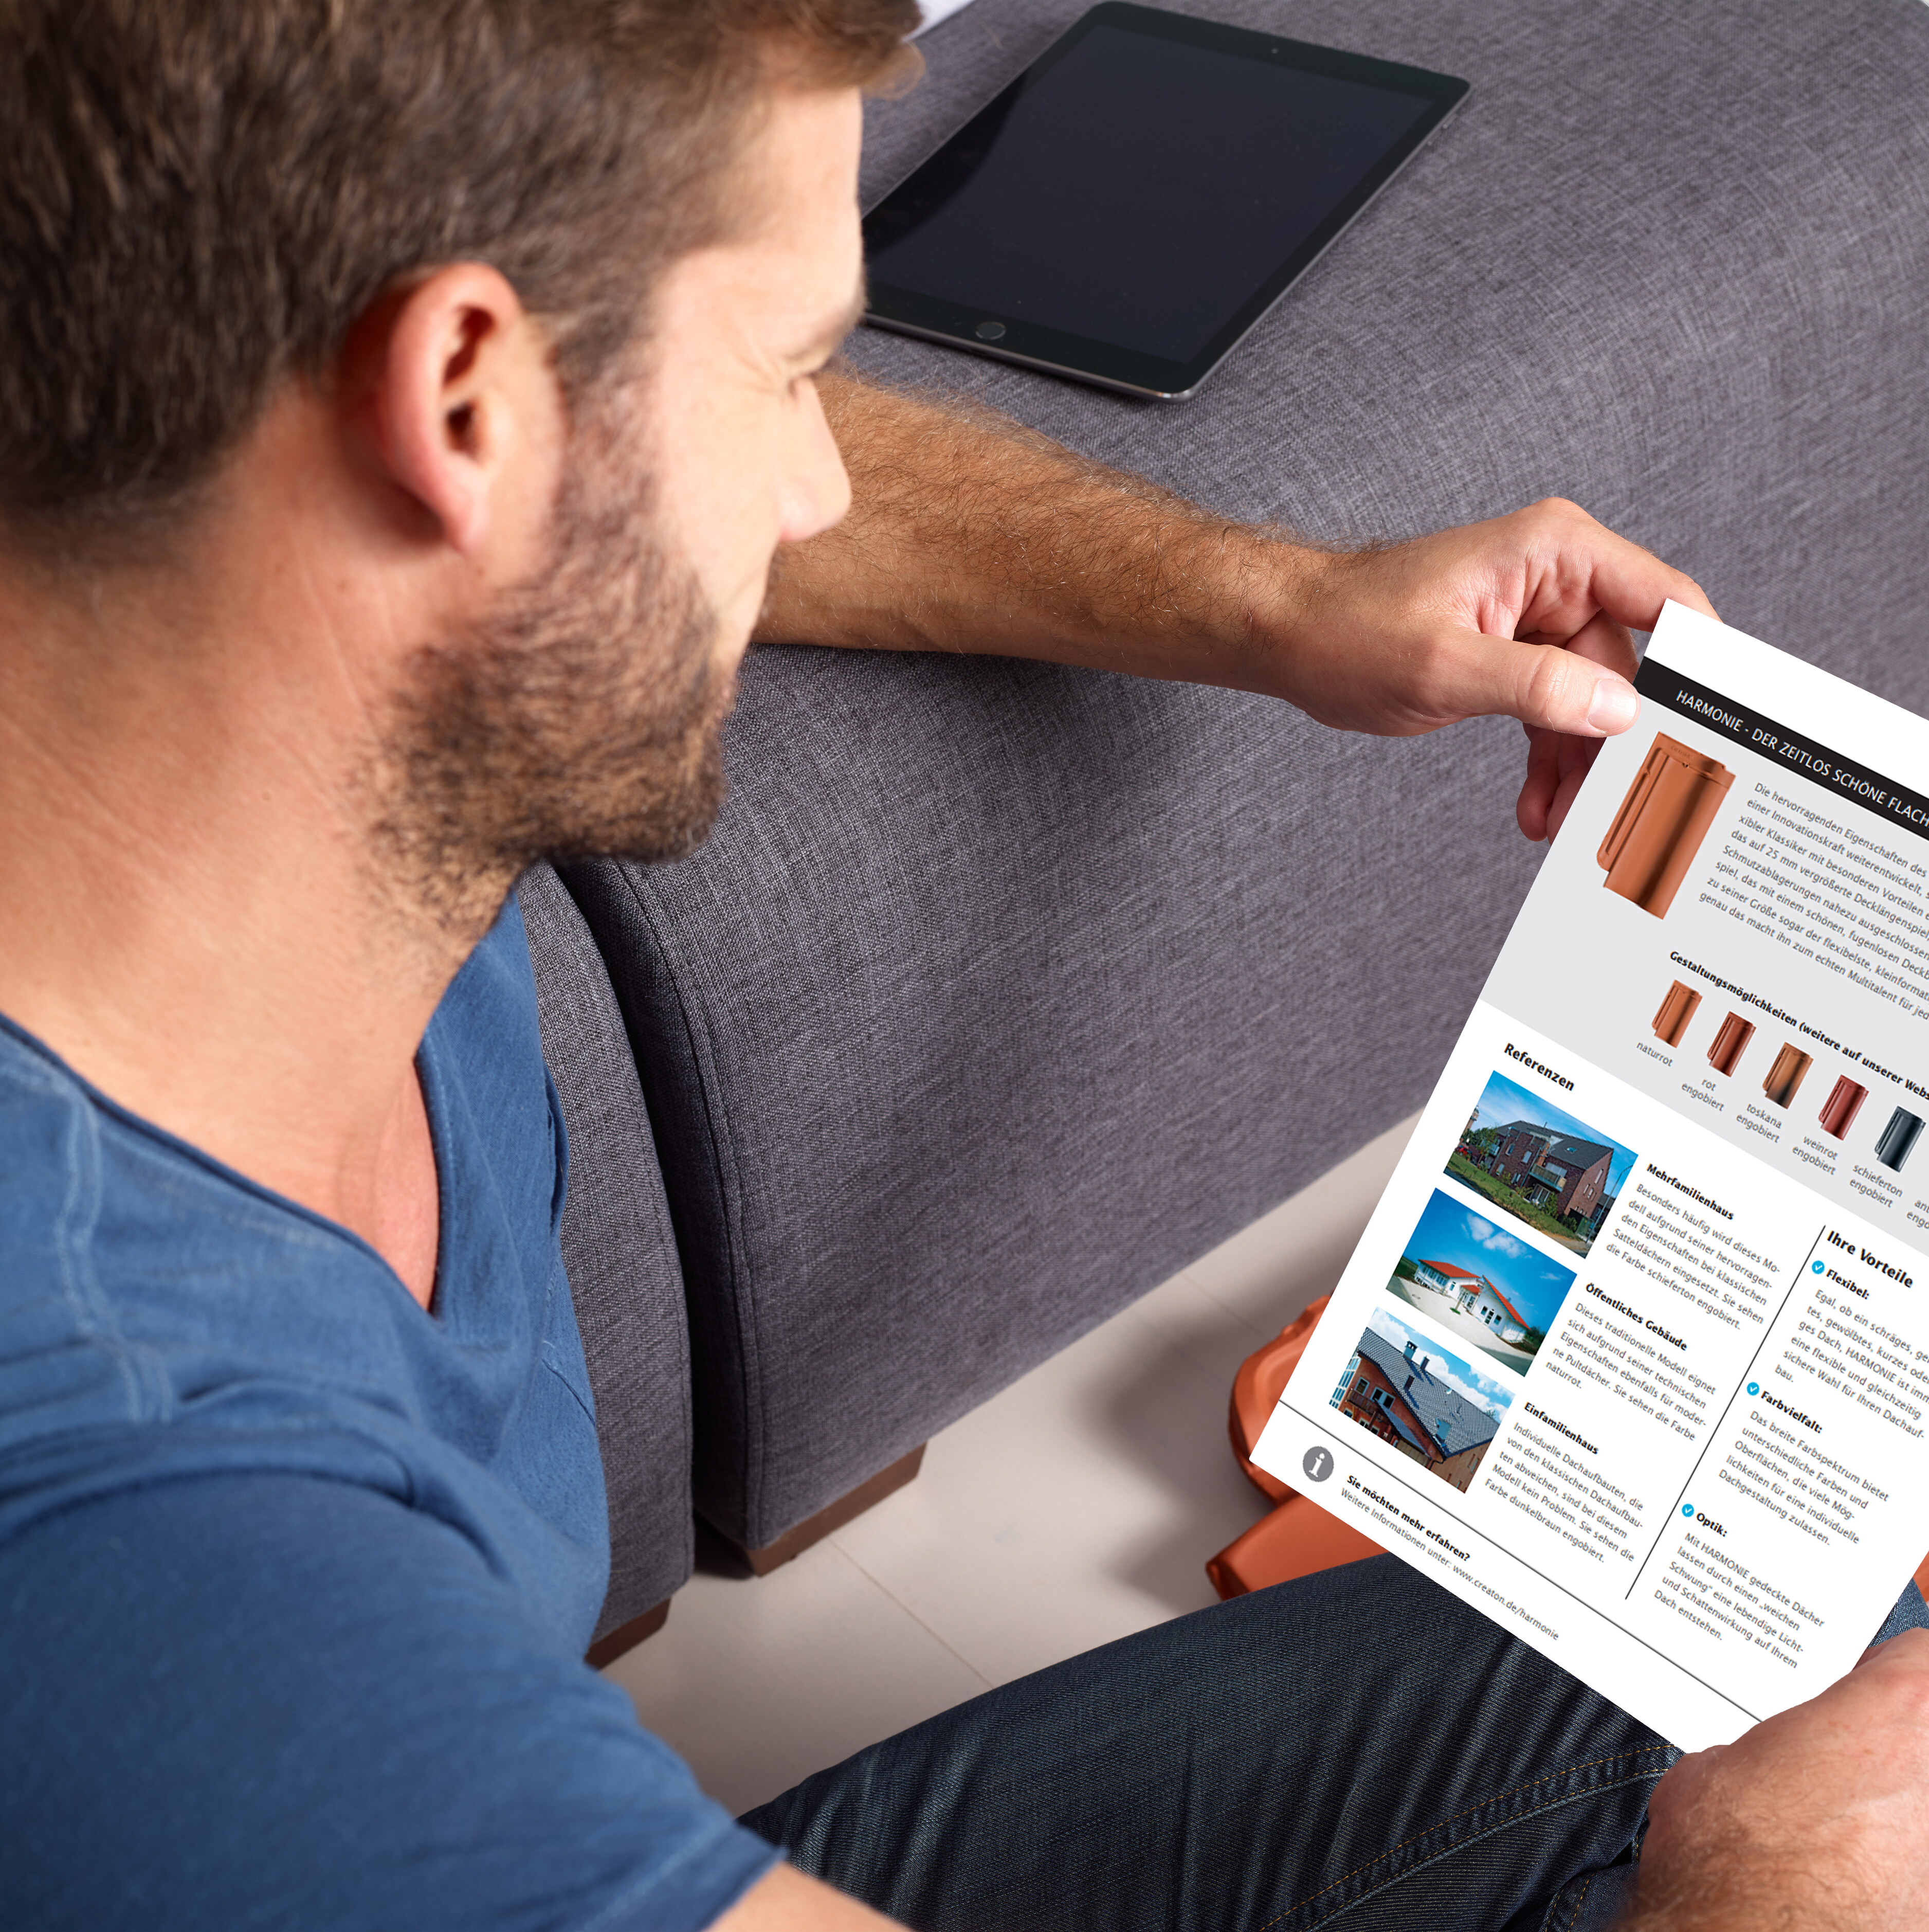 Customer is reading information